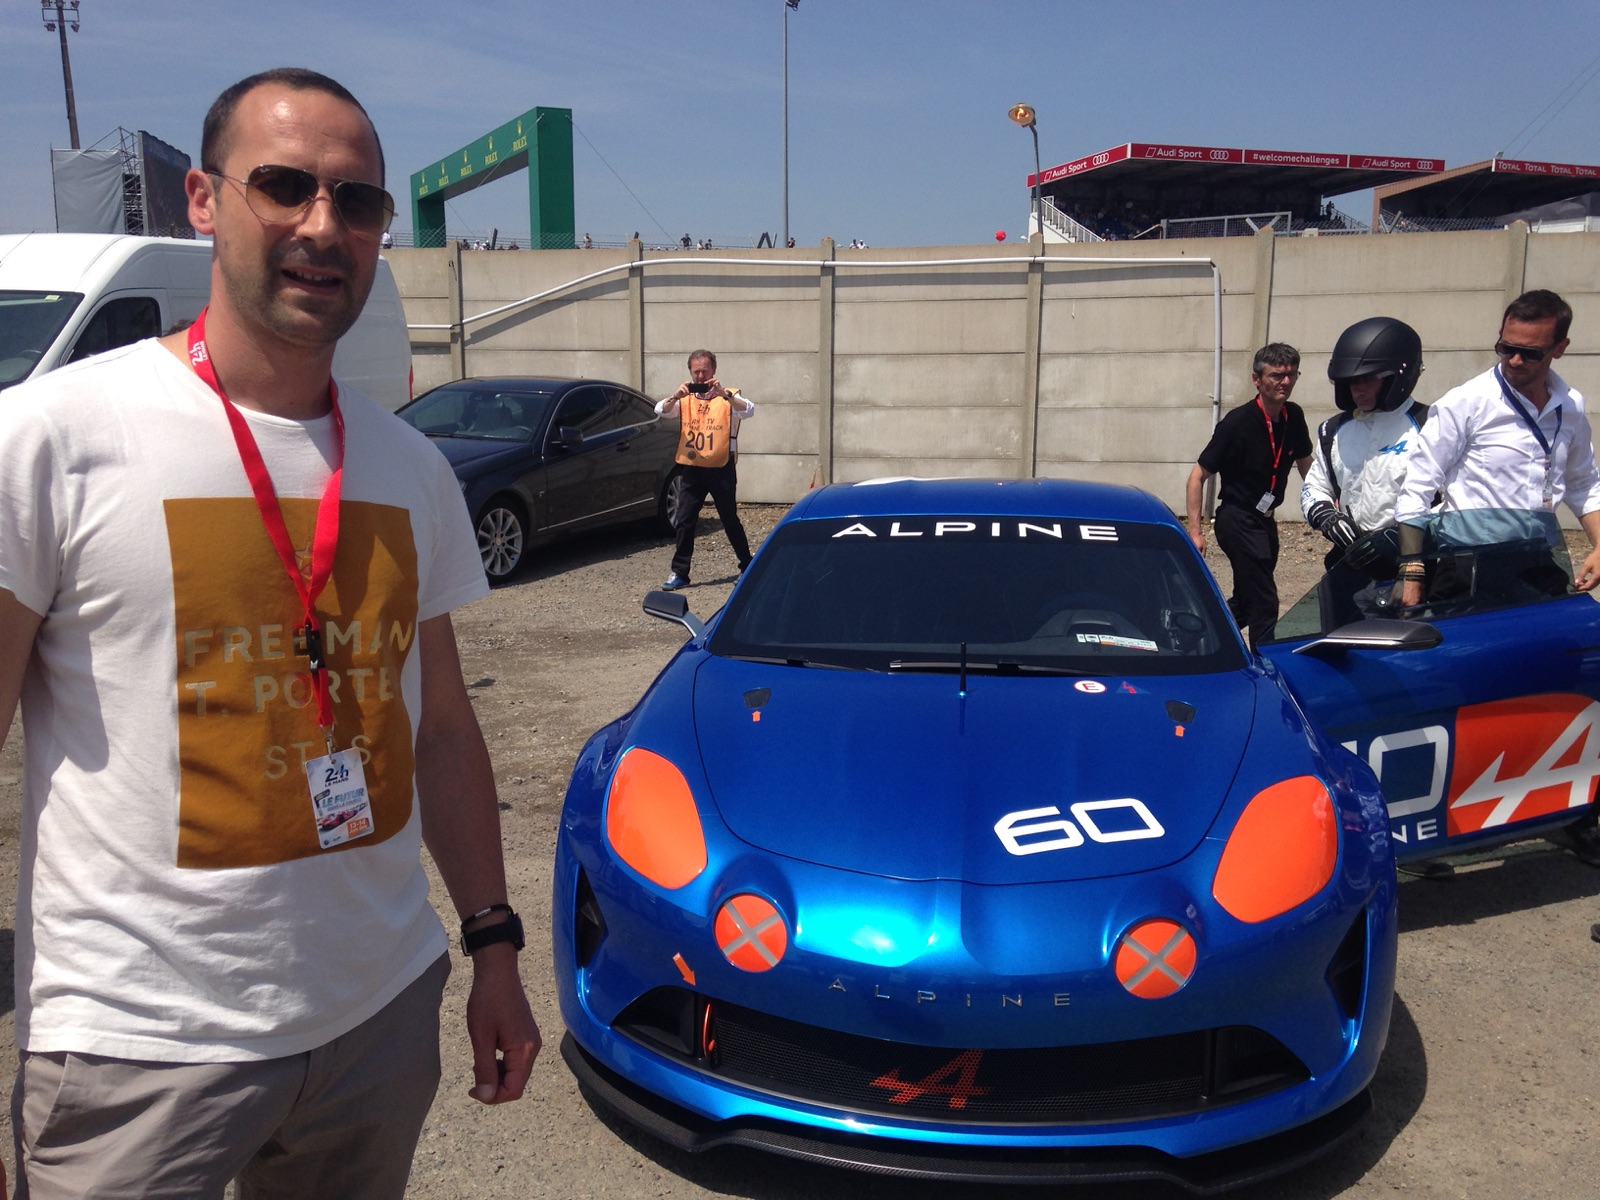 Alpine Z31 Inauguration Le Mans